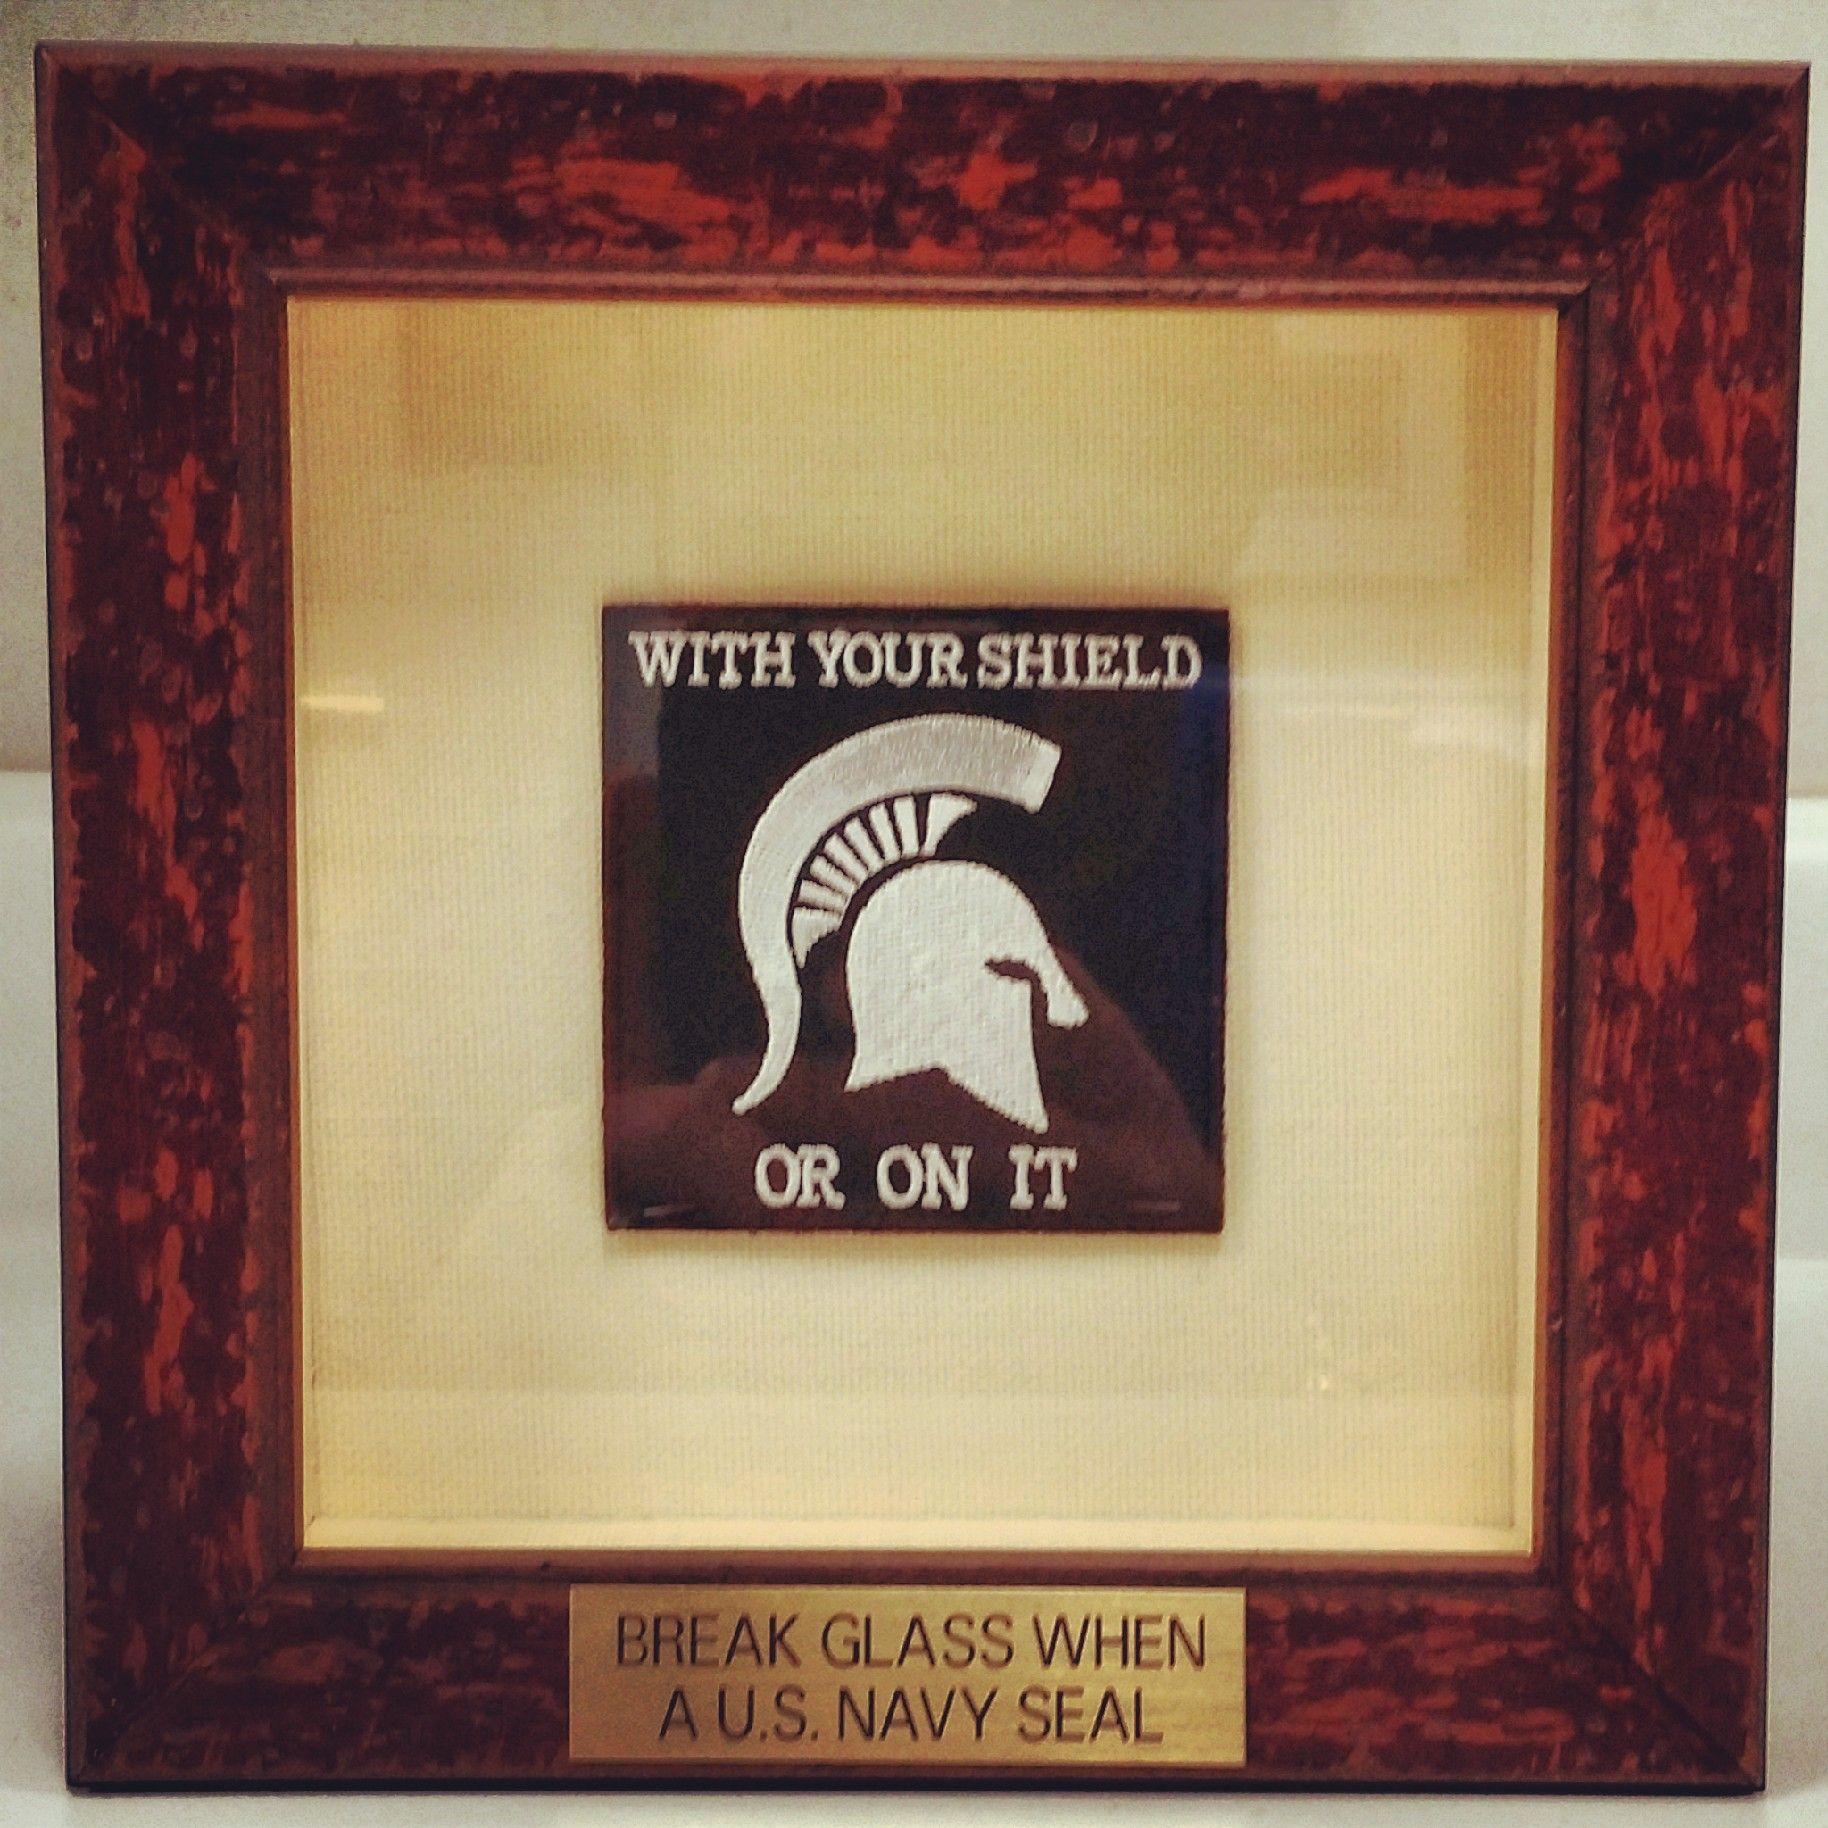 Break When A US Navy Seal framed in a rustic @Larson-Juhl shadowbox ...